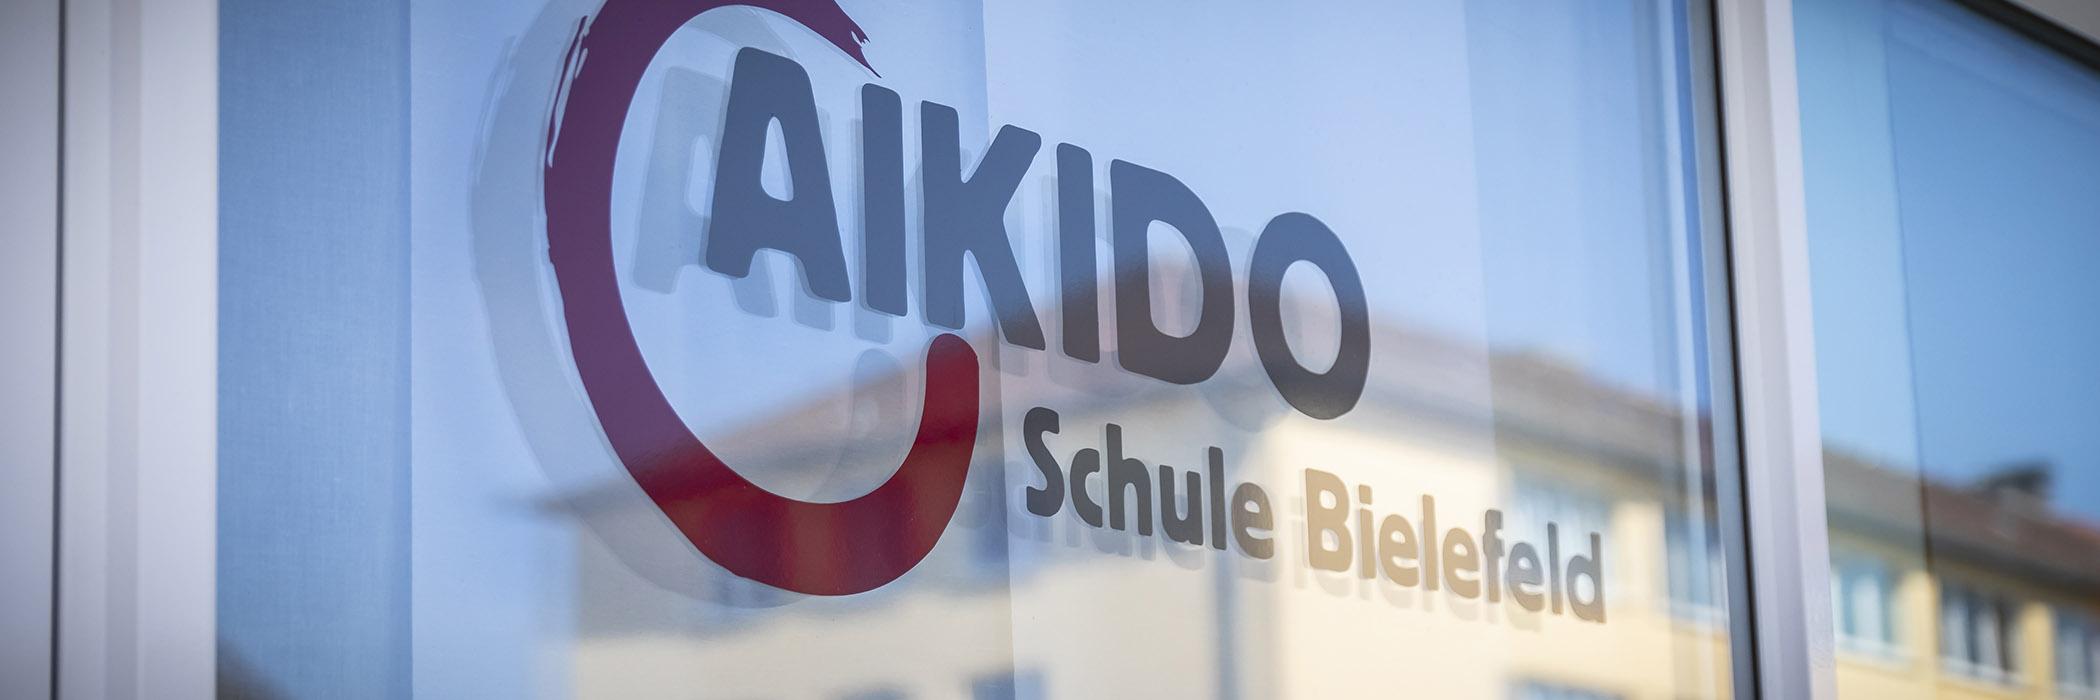 http://www.aikido-schule-bielefeld.de/wp-content/uploads/2018/12/dojoslider02.jpg